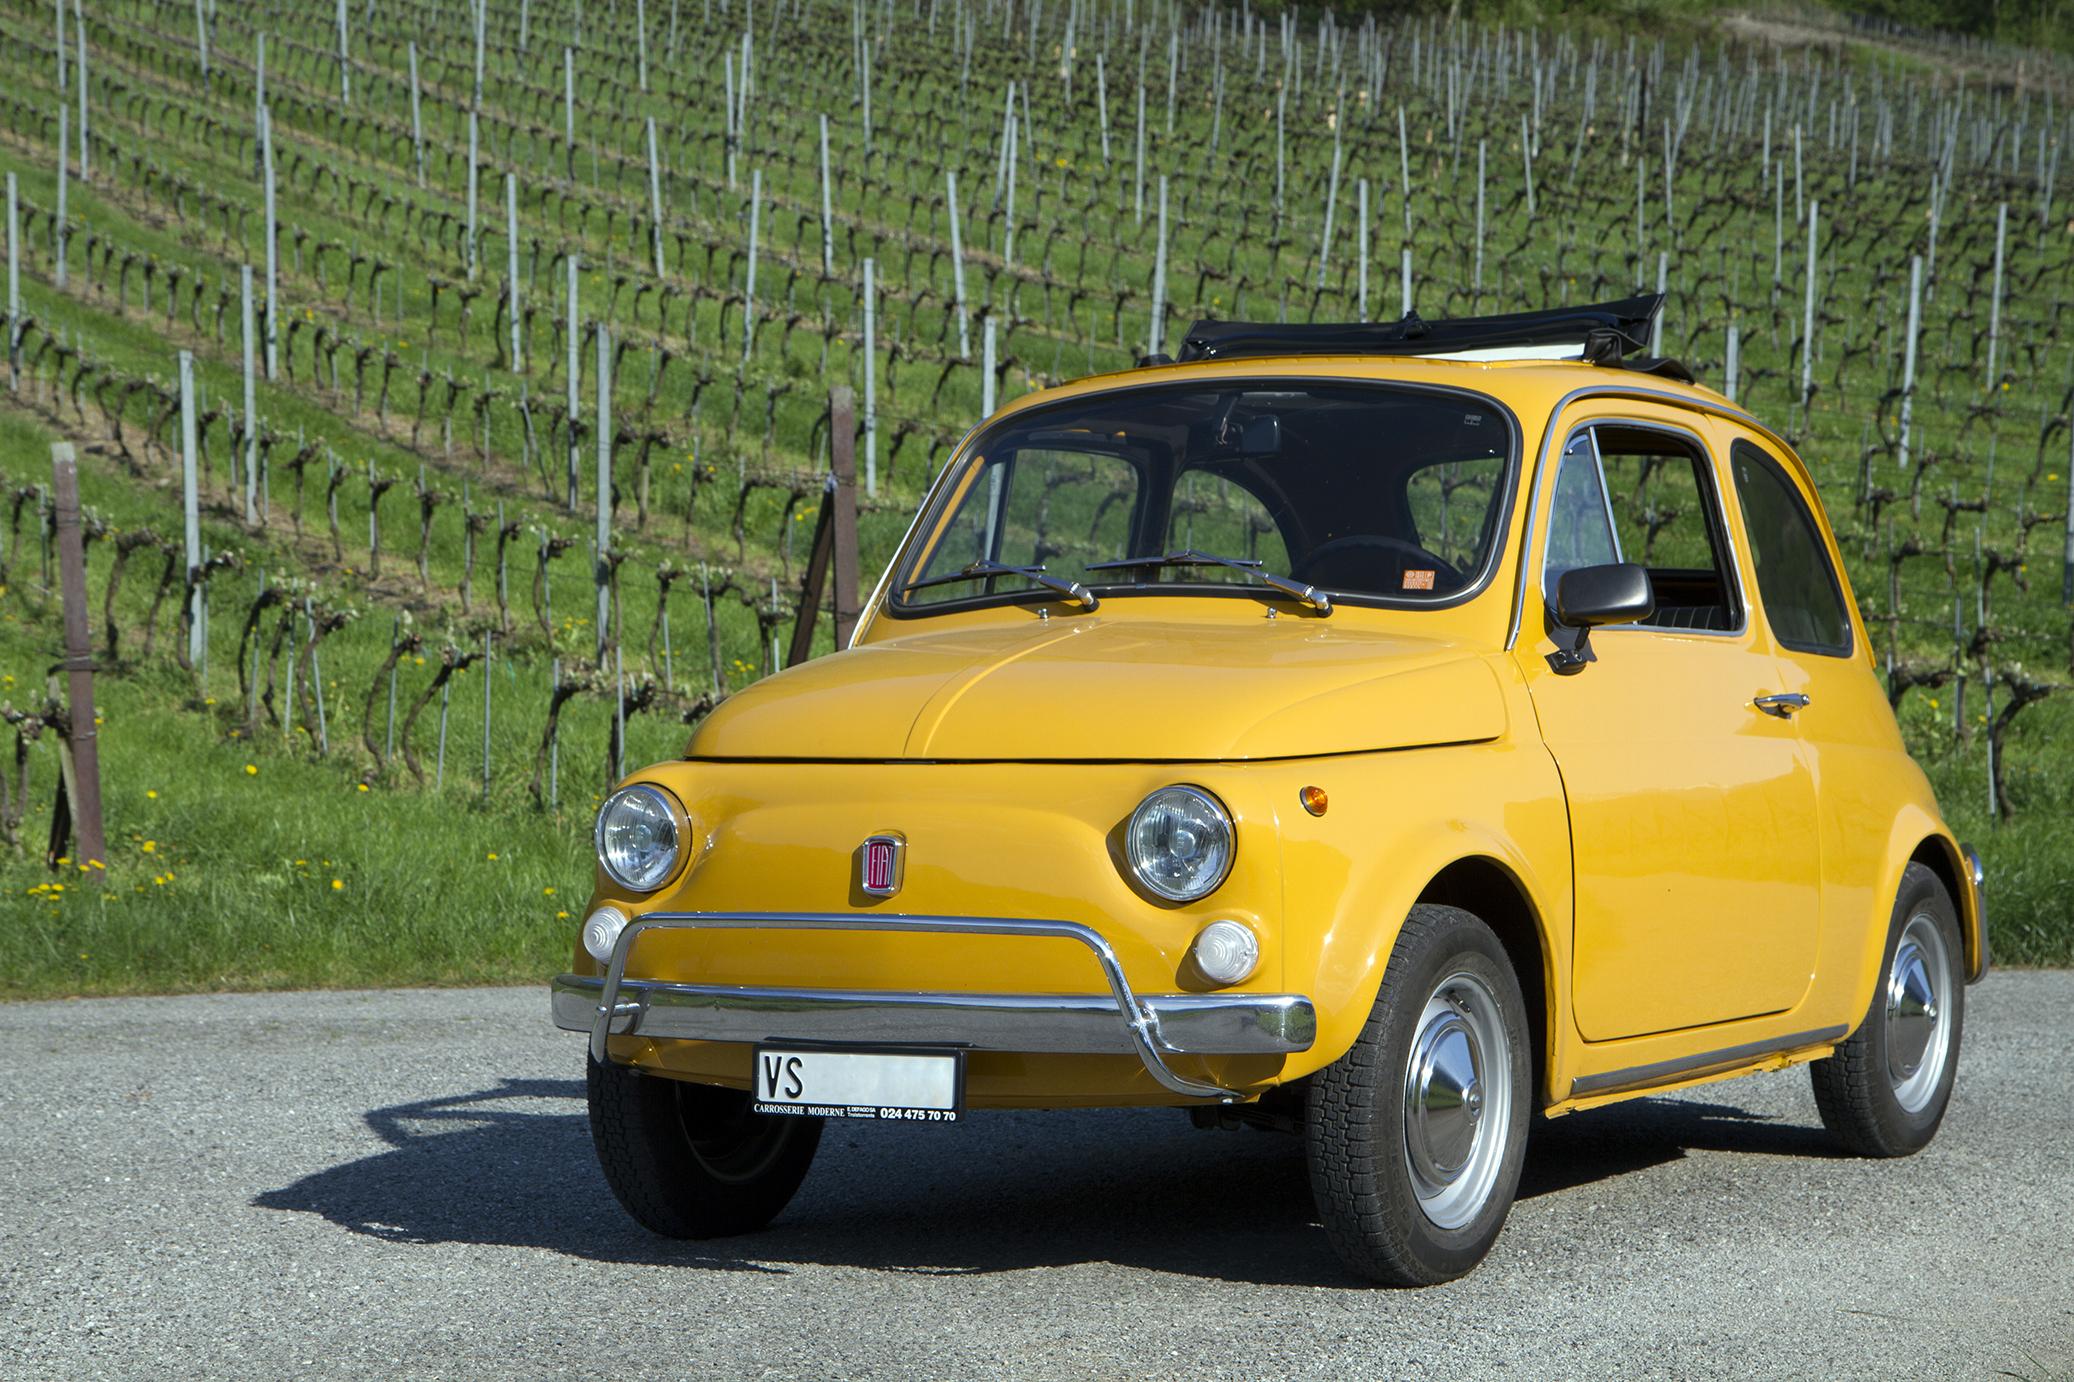 Fiat 500 face